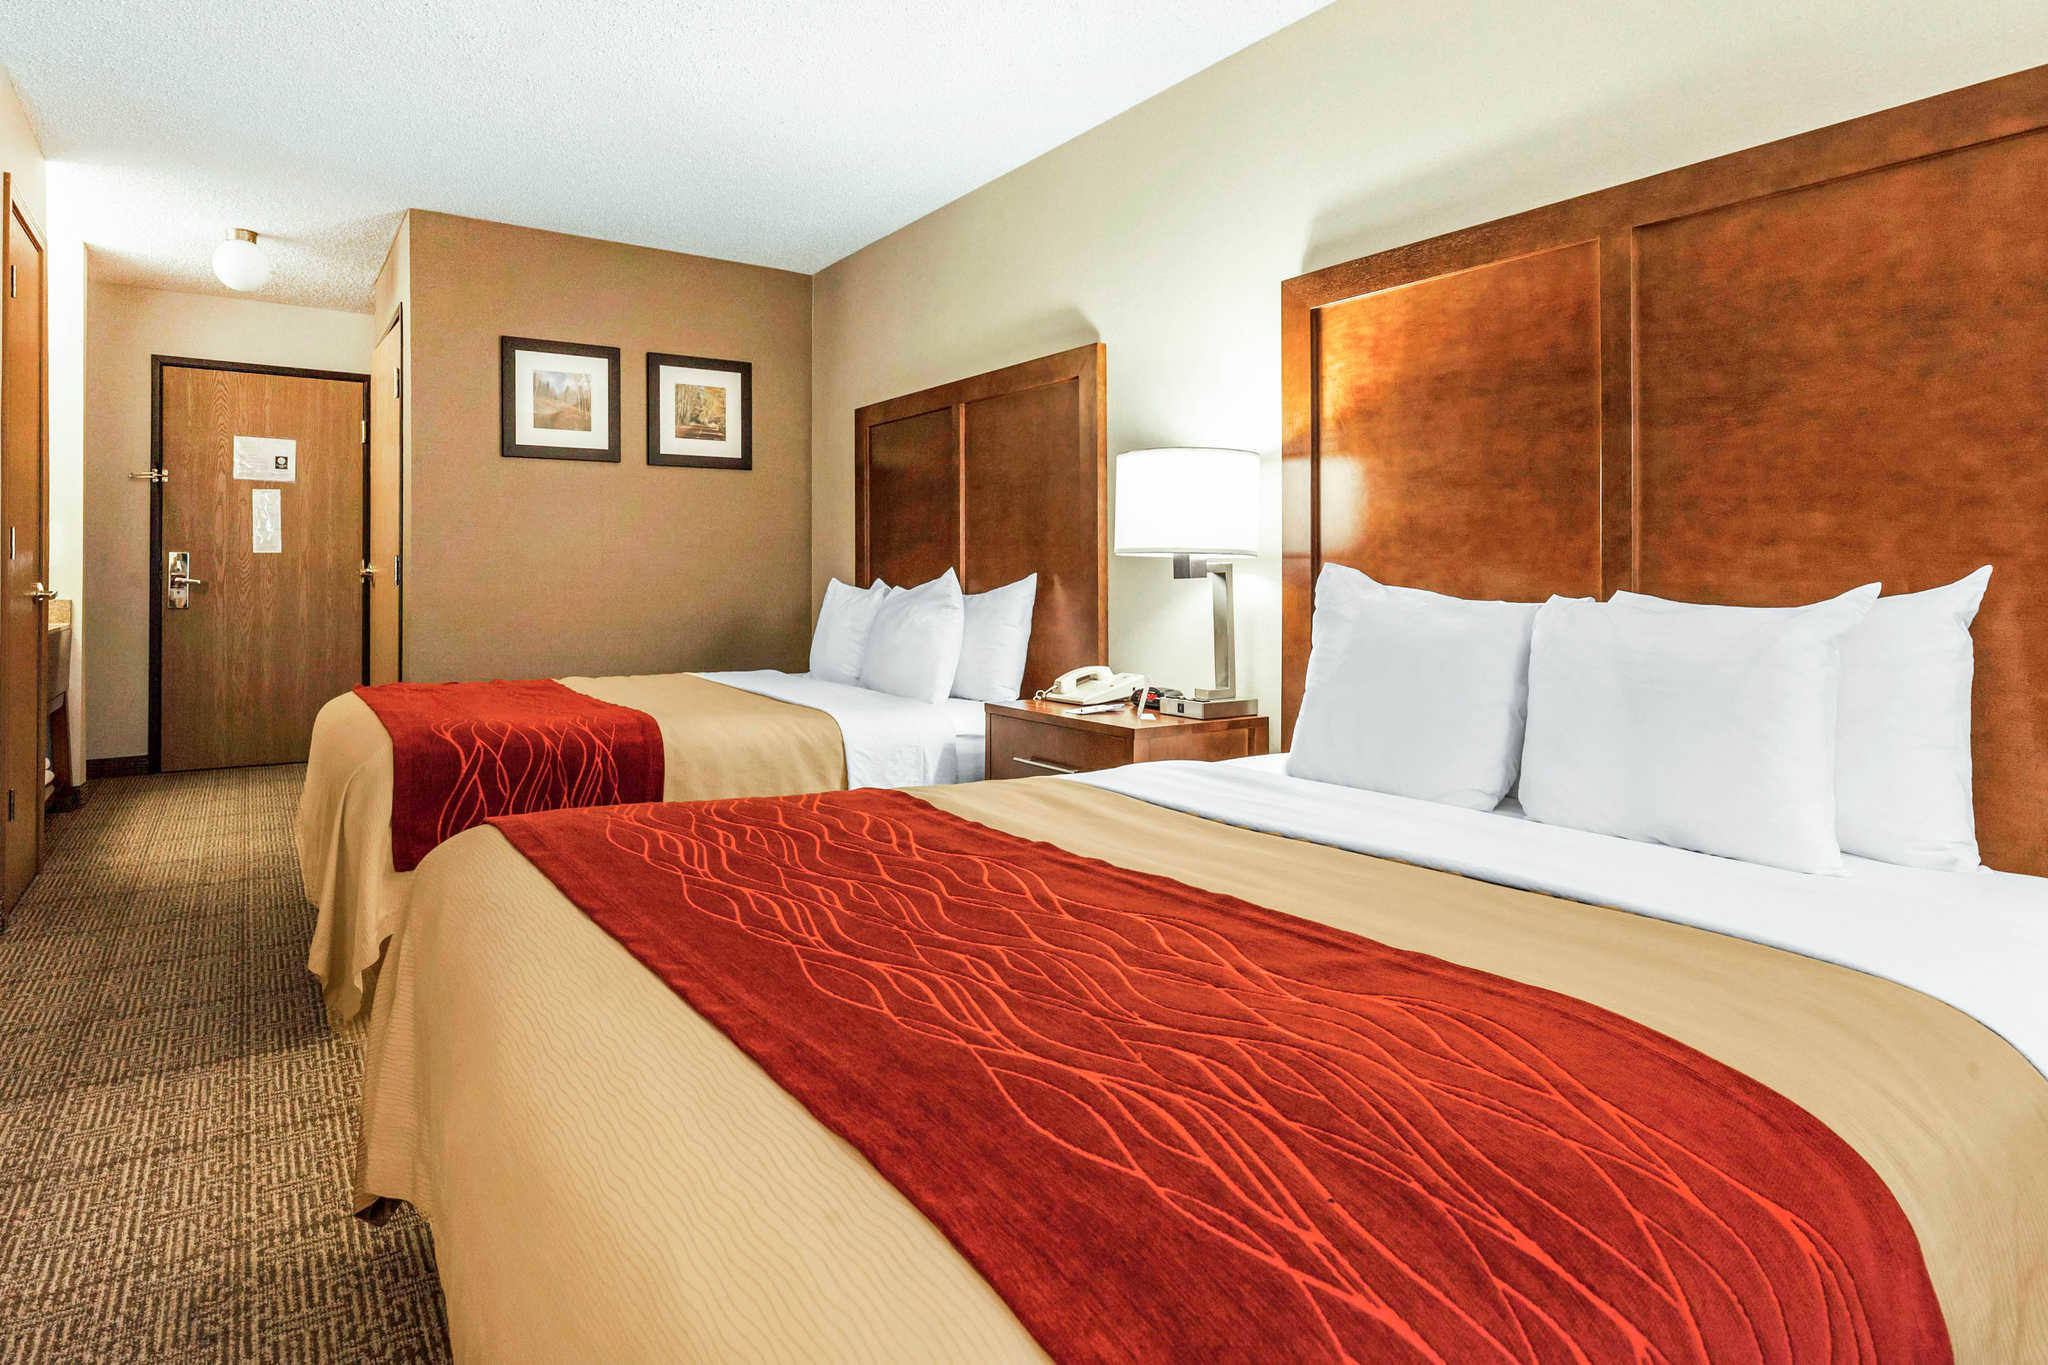 Comfort inn denver west wheat ridge colorado for The family room wheat ridge